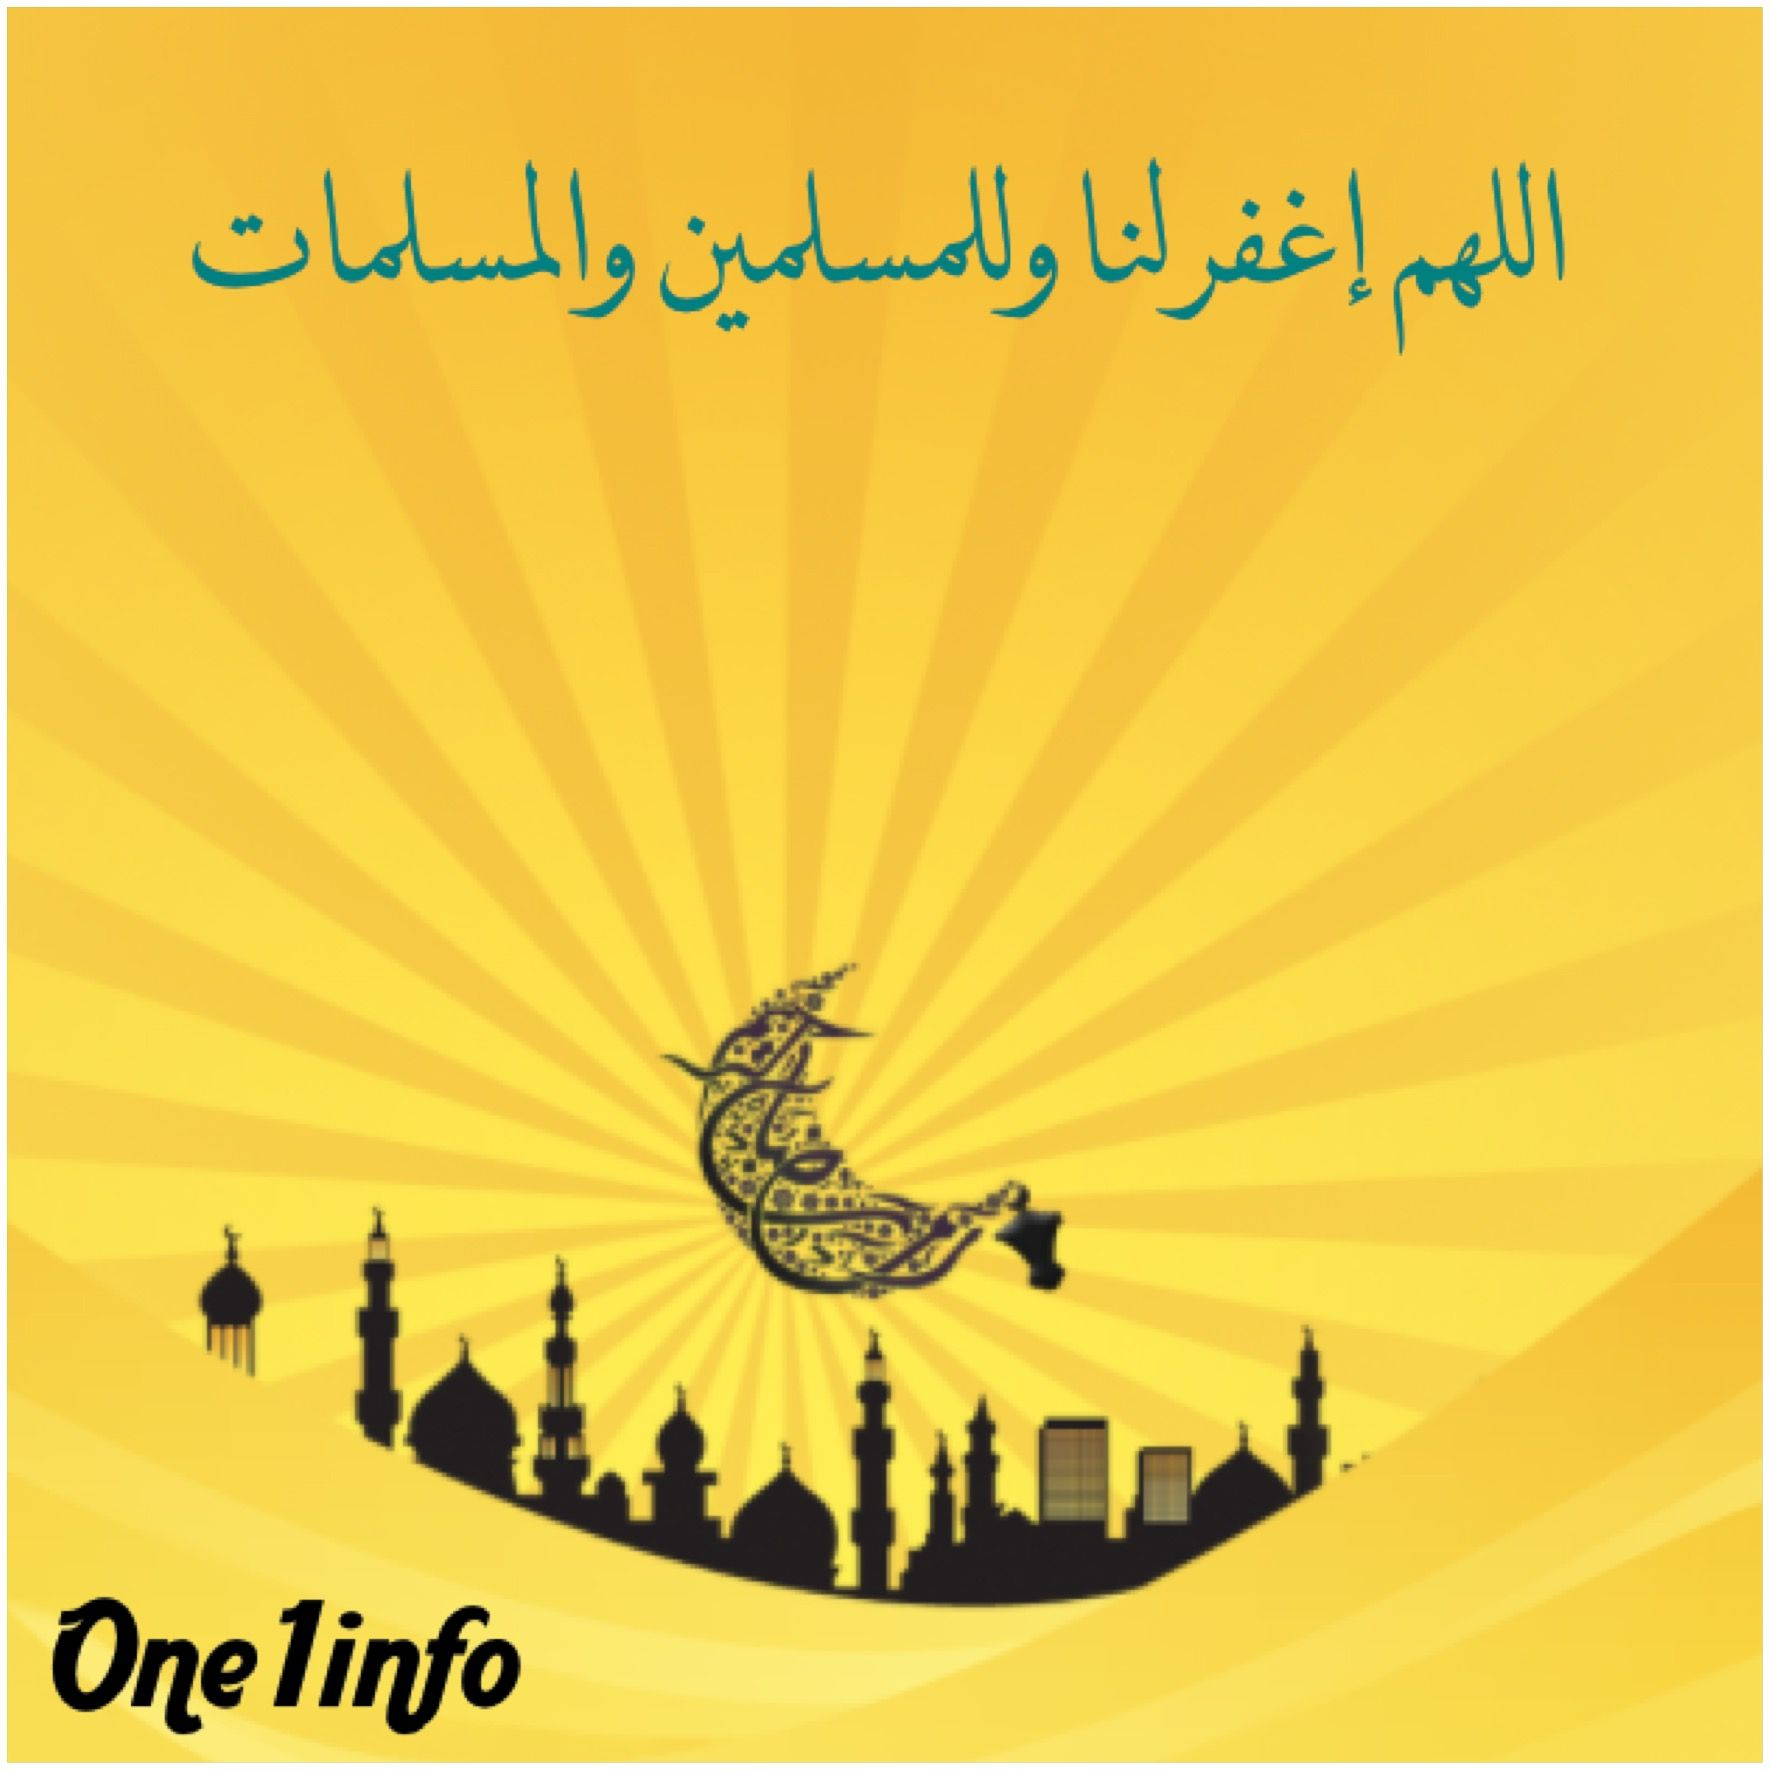 Pin by one1info on ramadan kareem pinterest ramadan 30 best ramadan greeting card designs and backgrounds kristyandbryce Choice Image